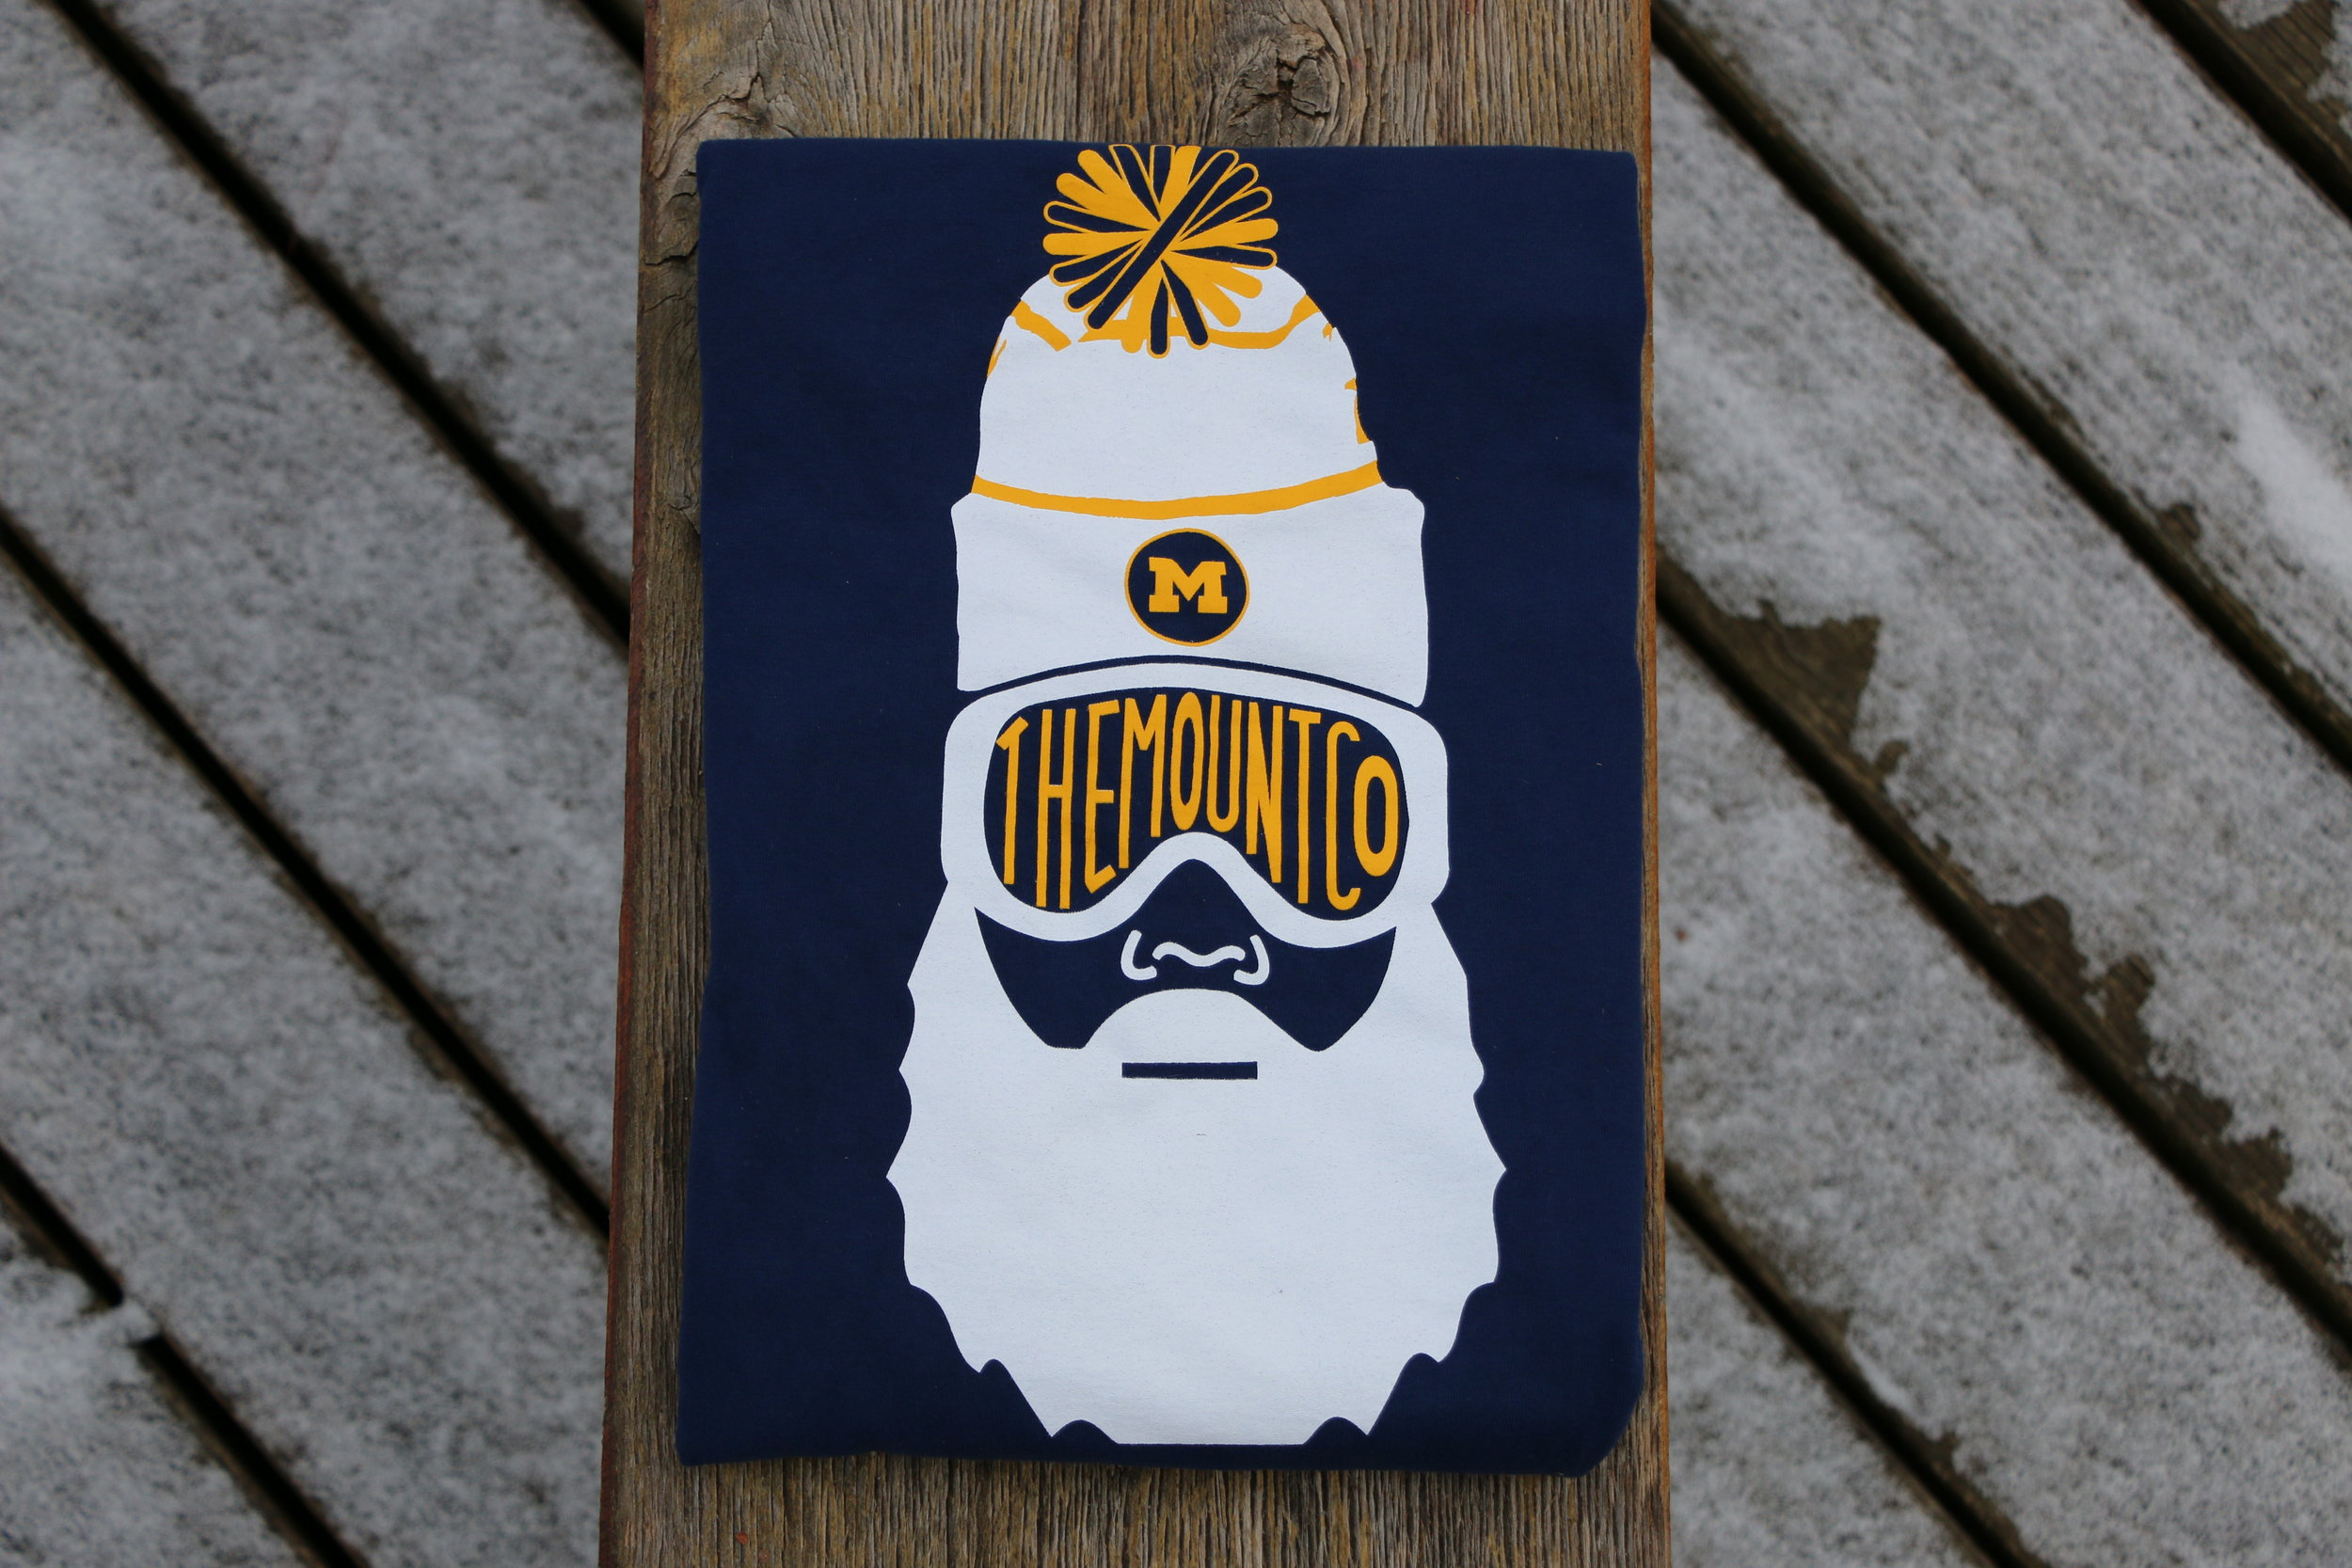 University of Michigan ski team hanging with the bearded man.